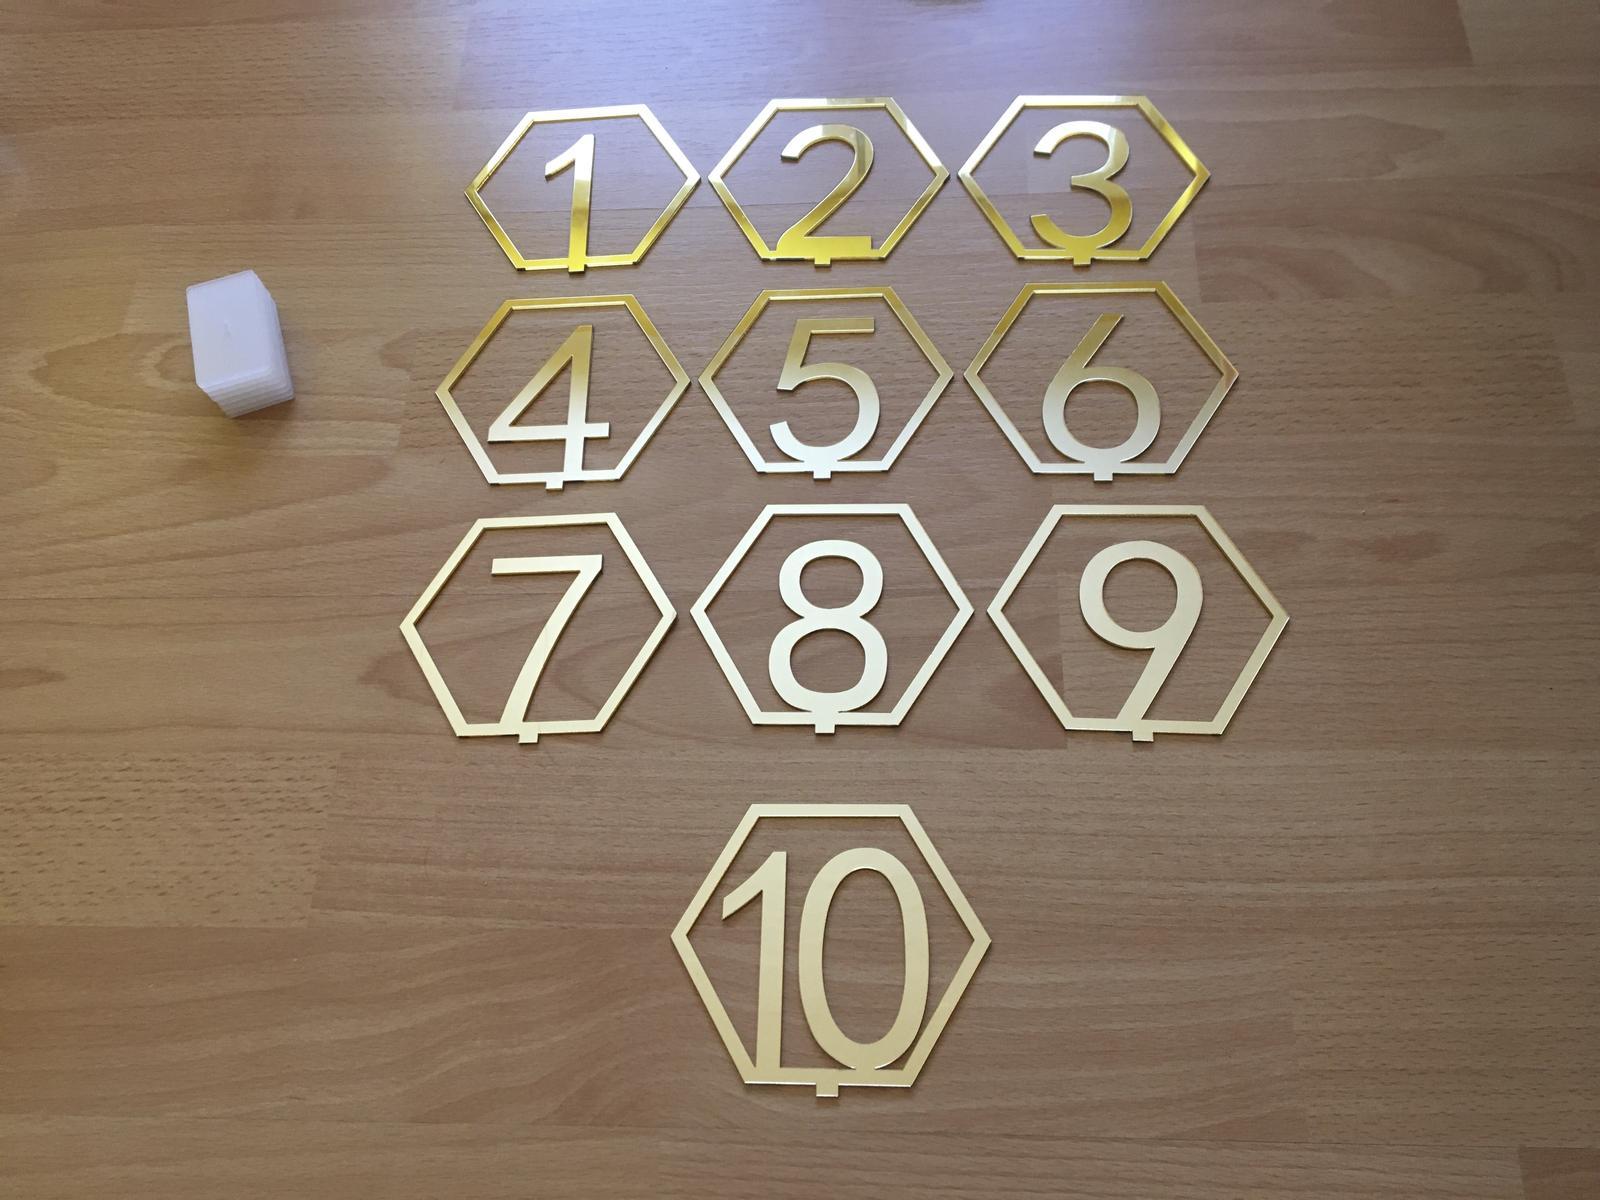 Čísla stolov - Obrázok č. 1